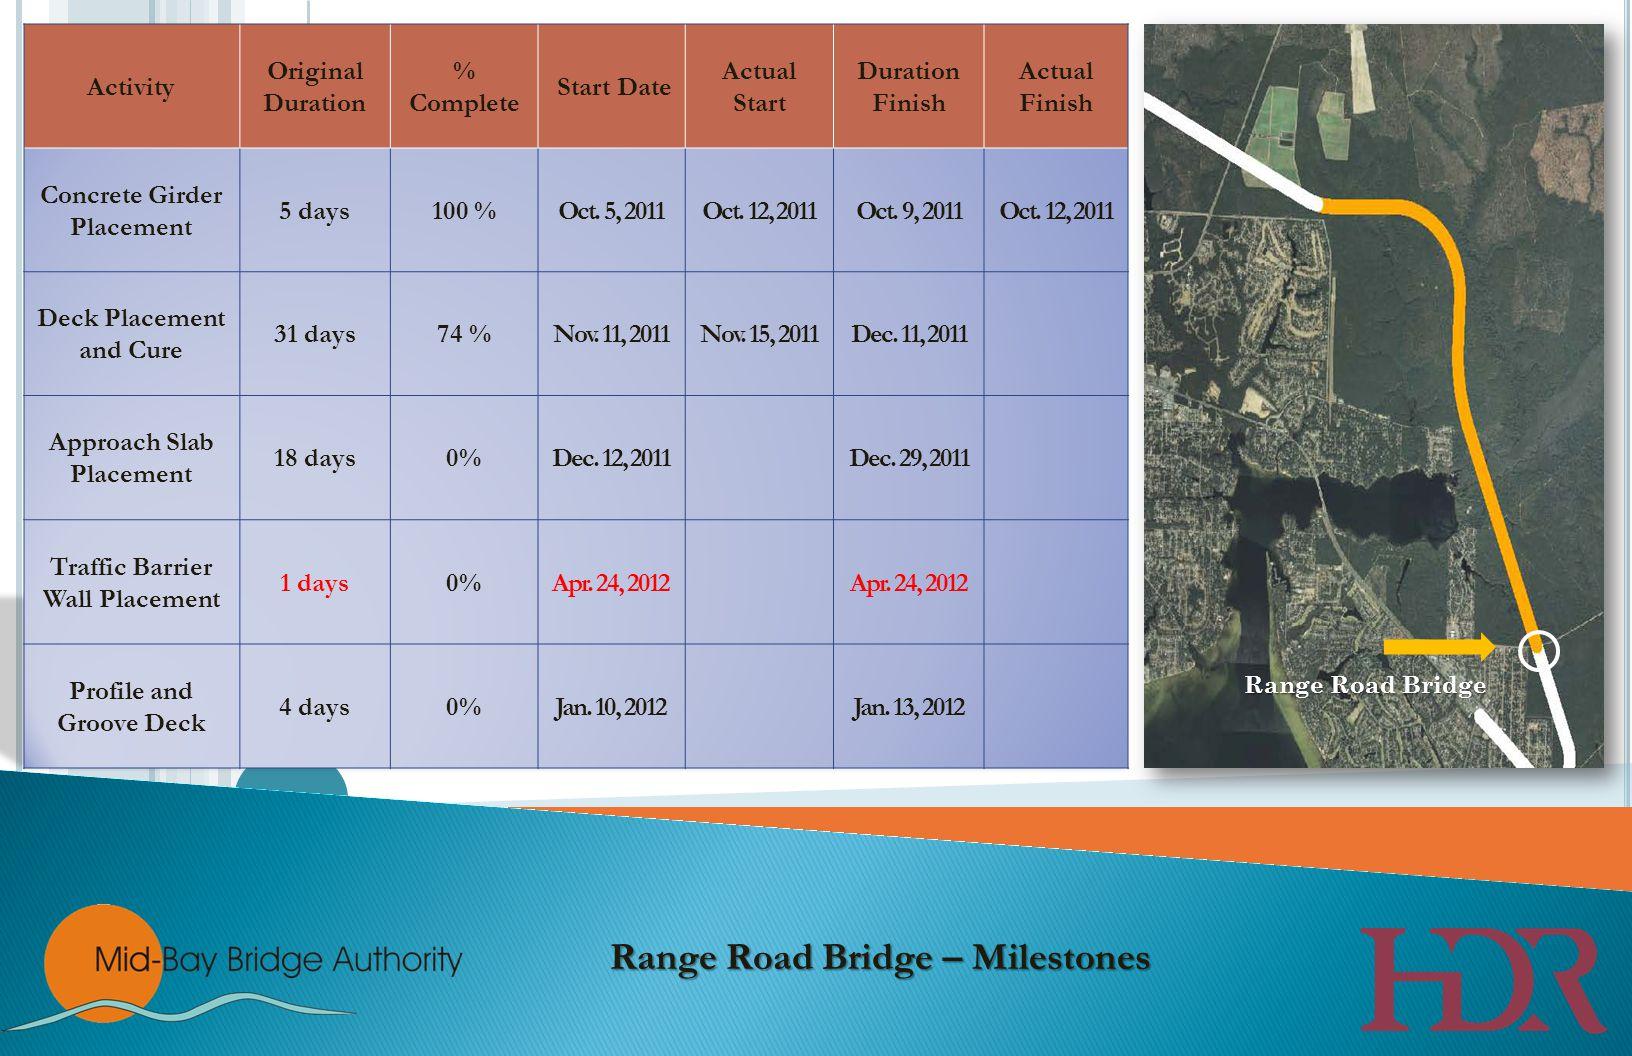 Range Road Bridge Range Road Bridge – Milestones